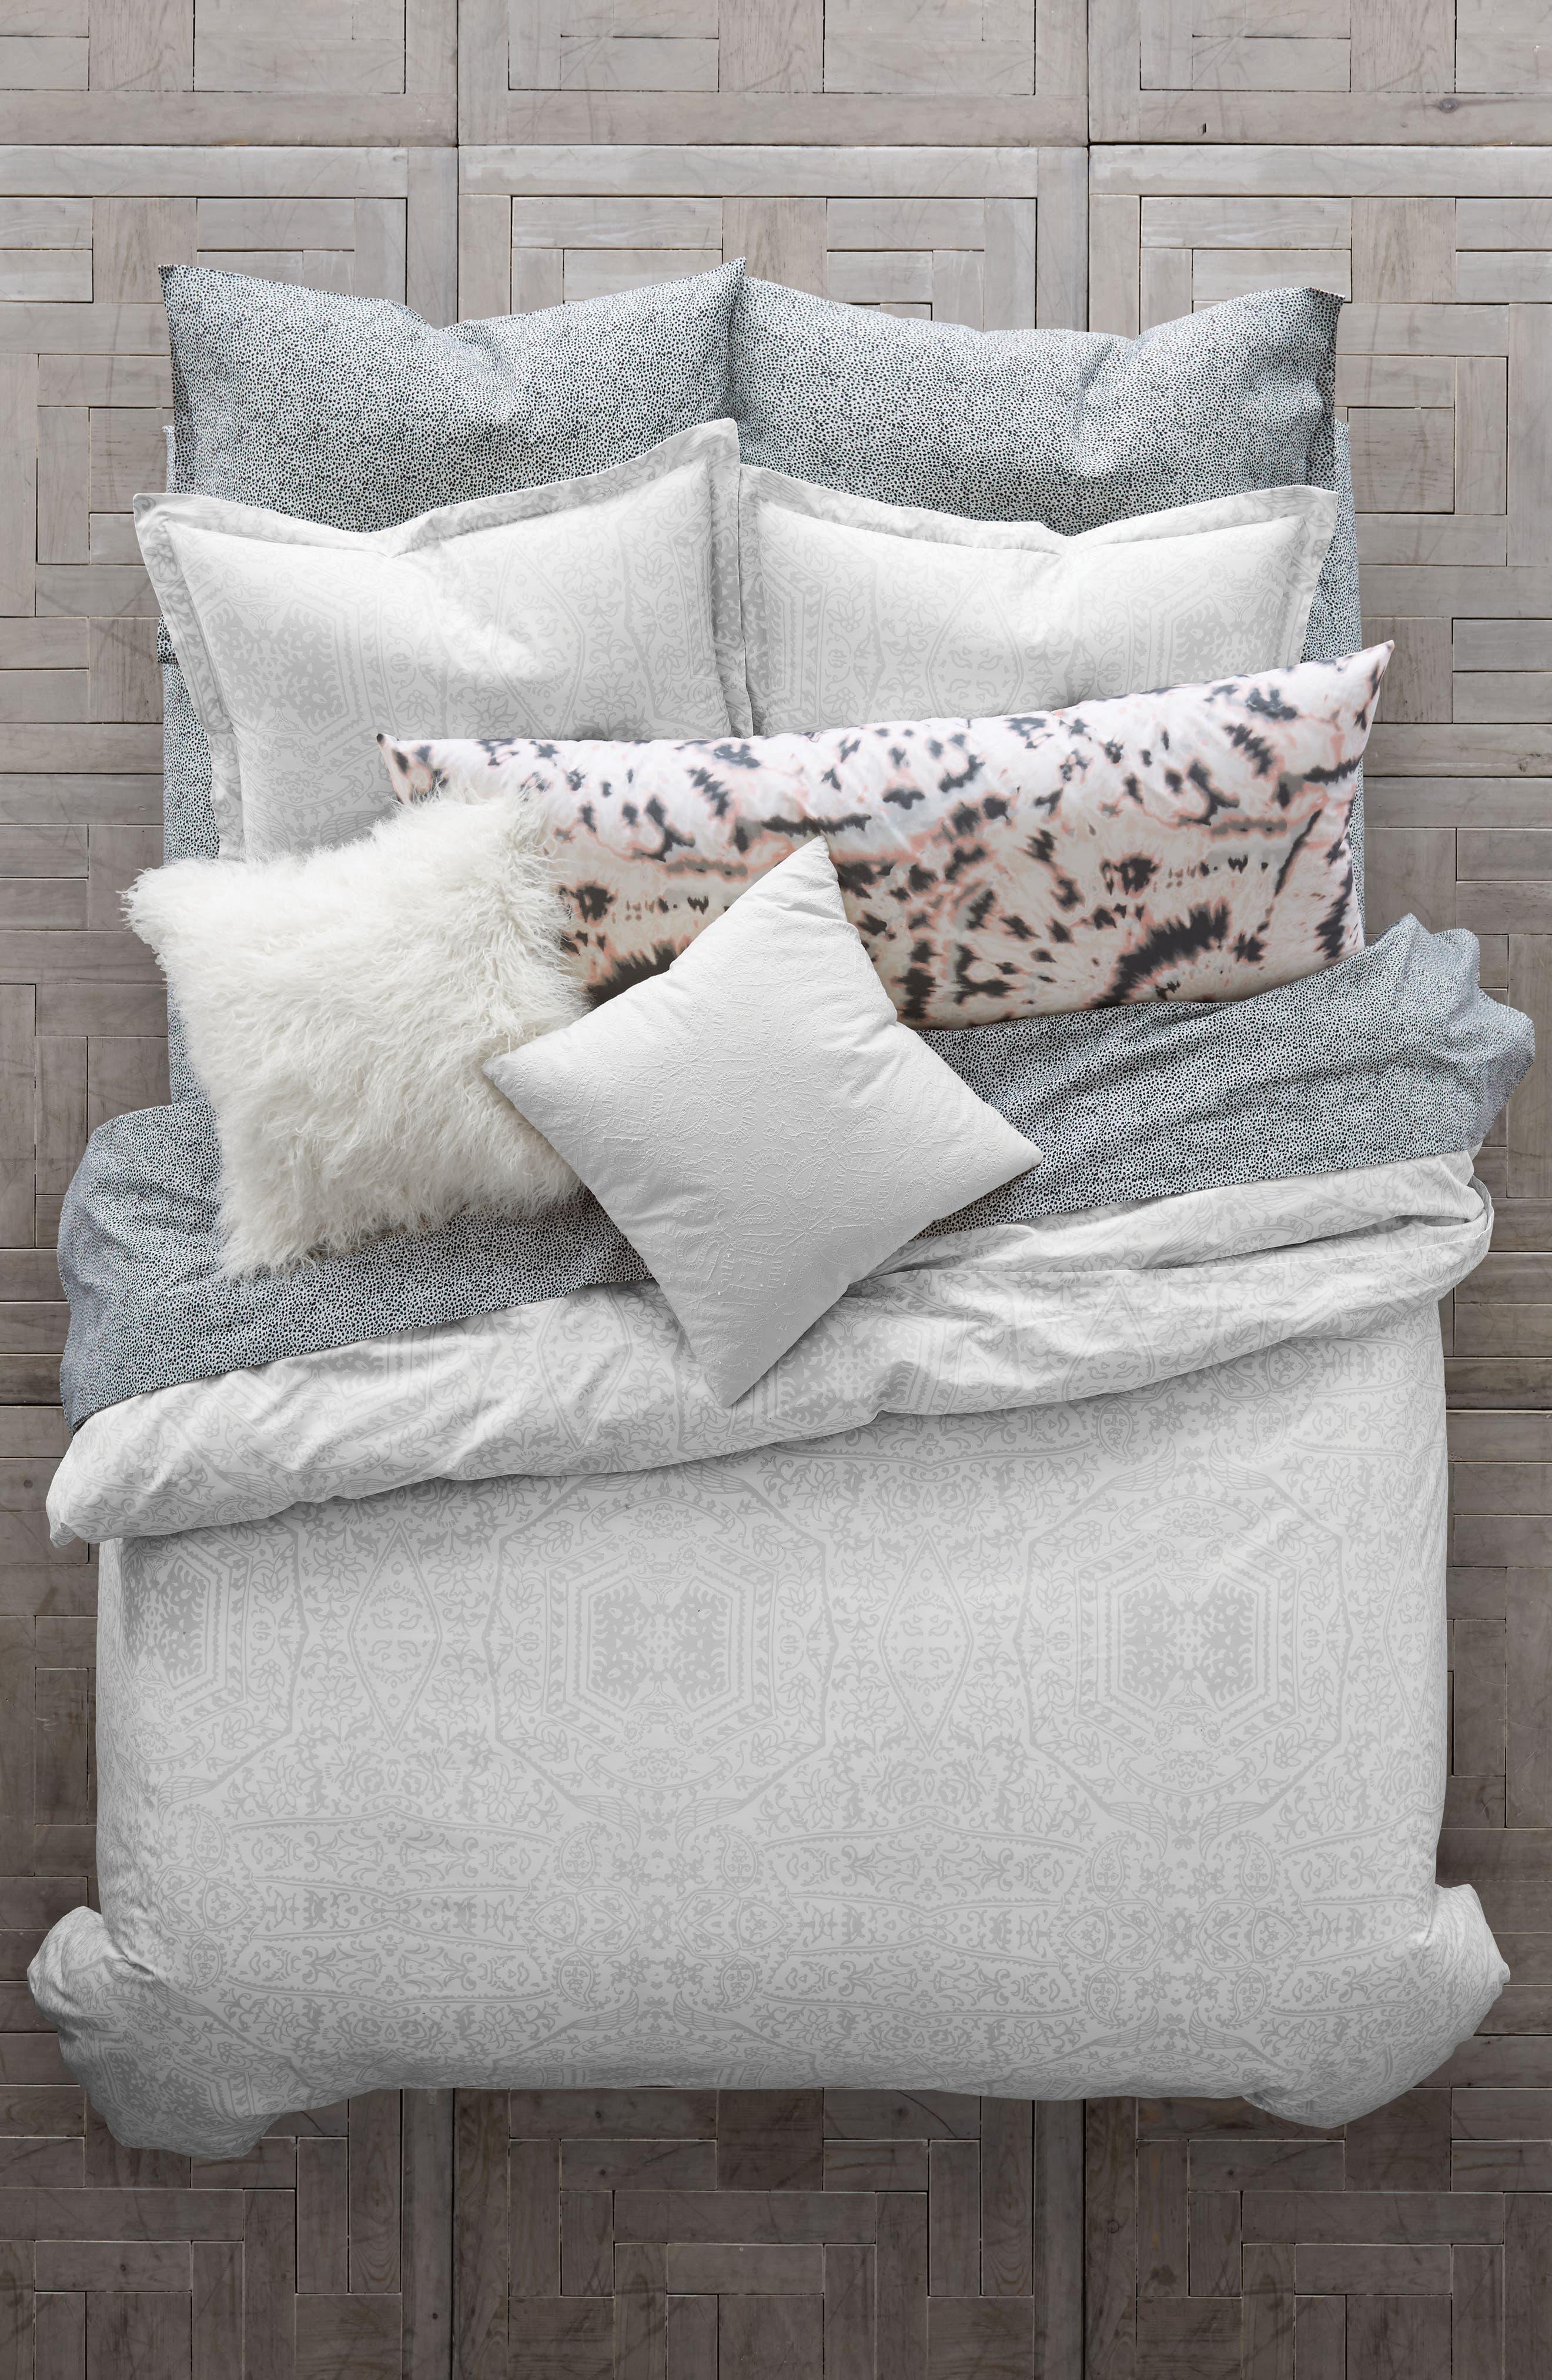 Alternate Image 1 Selected - BCBGeneration Chantilly Lace Comforter & Sham Set